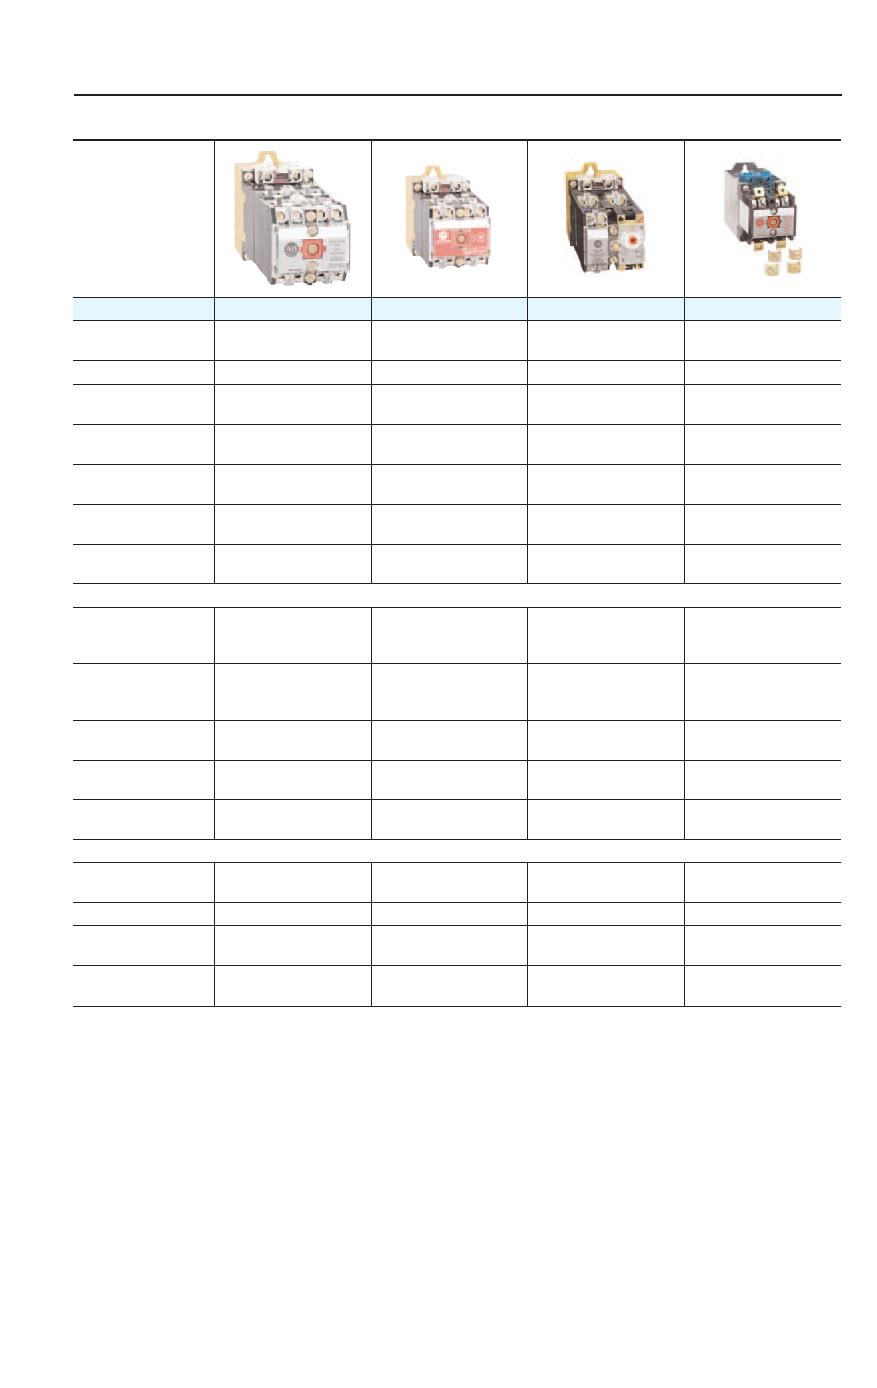 700-CRF pdf, arduino